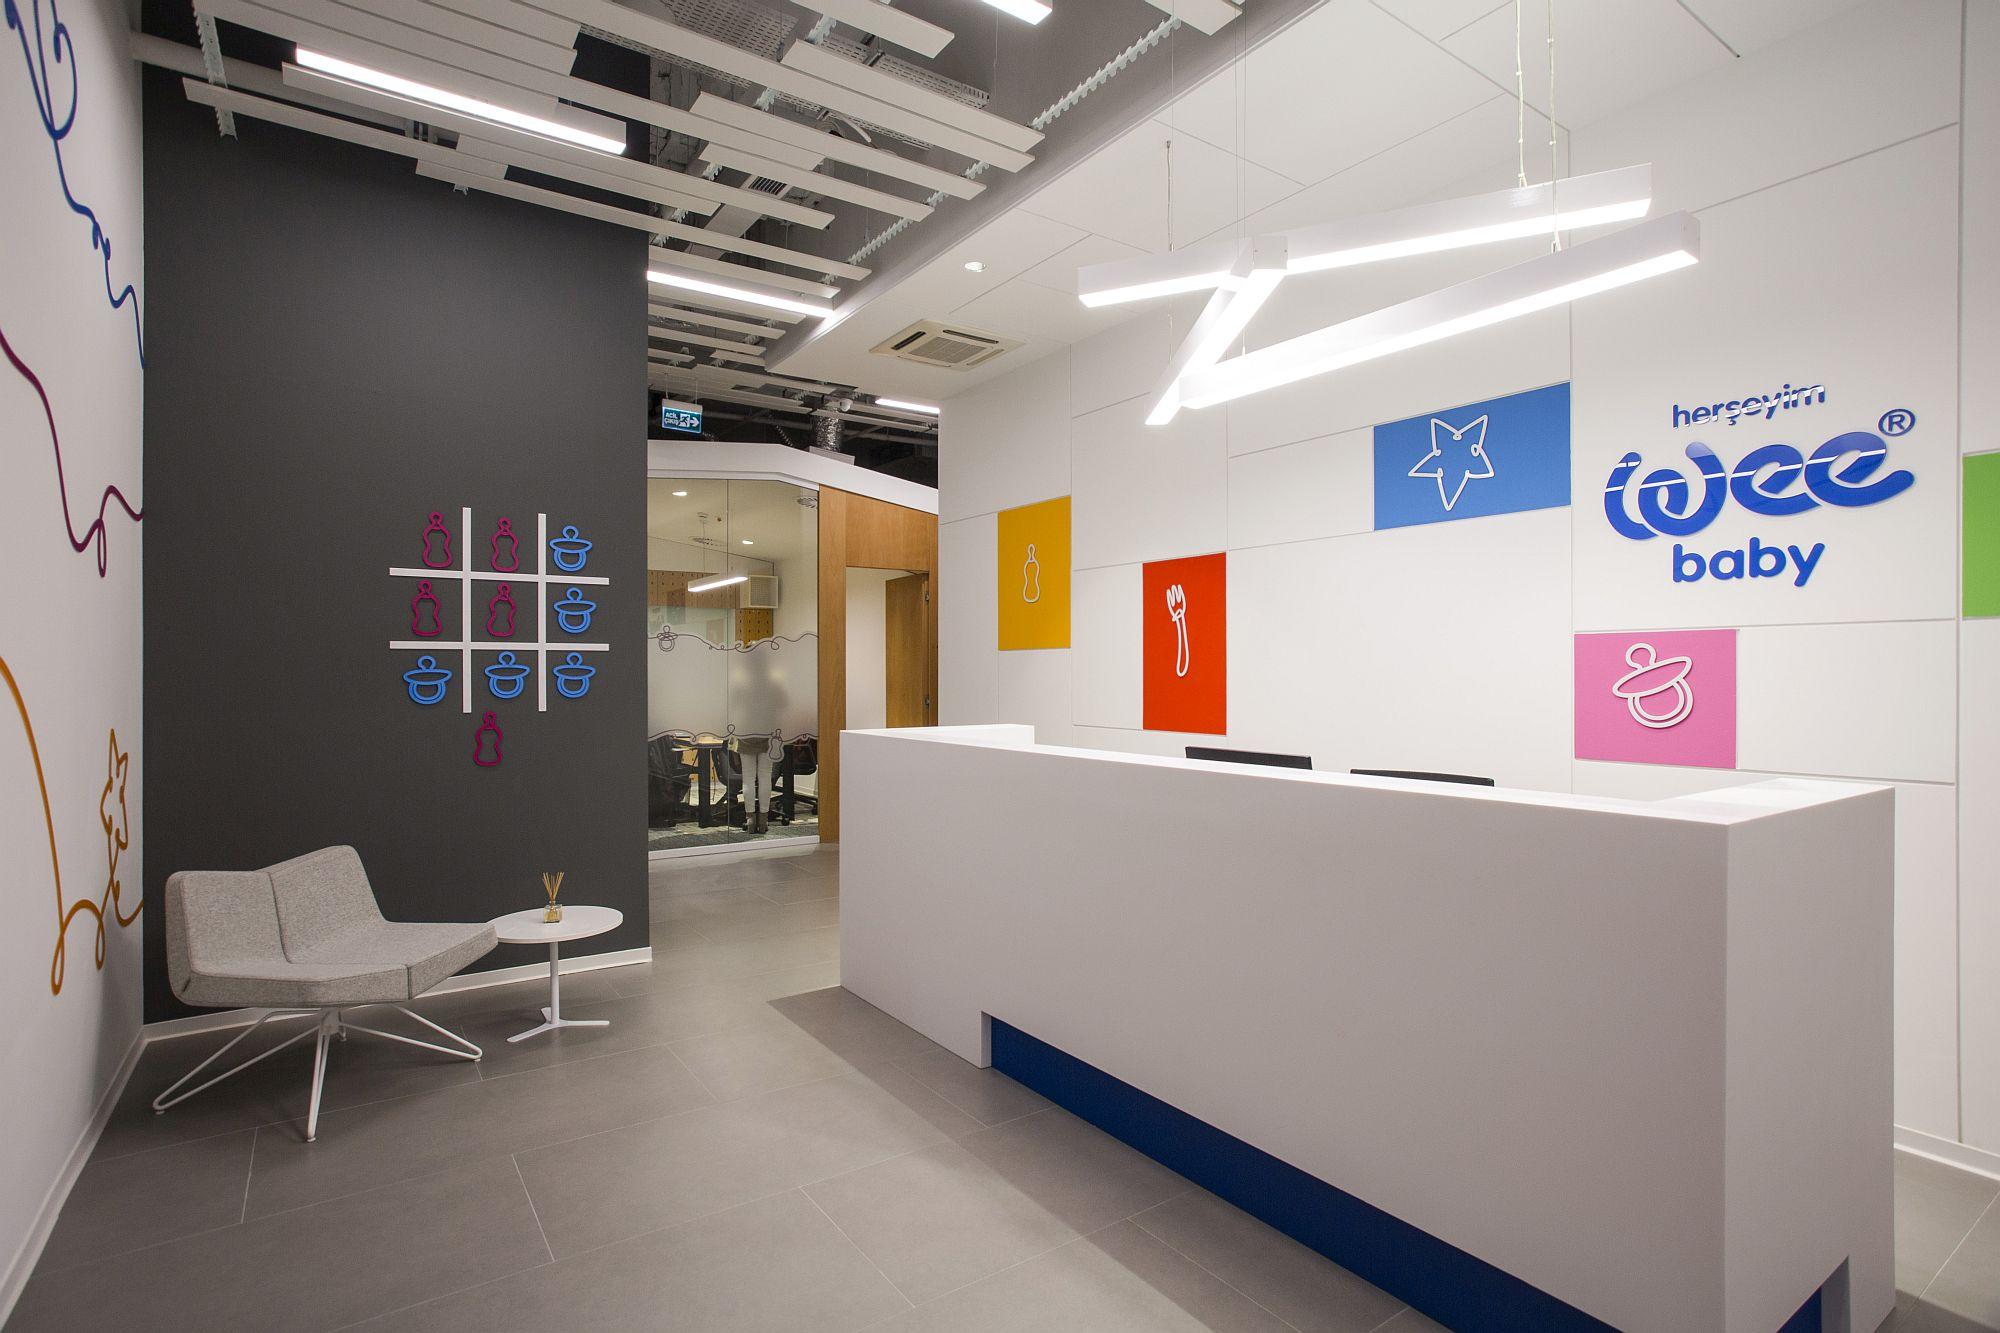 Burda Bebek\u0027s Office in Istanbul: Polished with a Playful ...